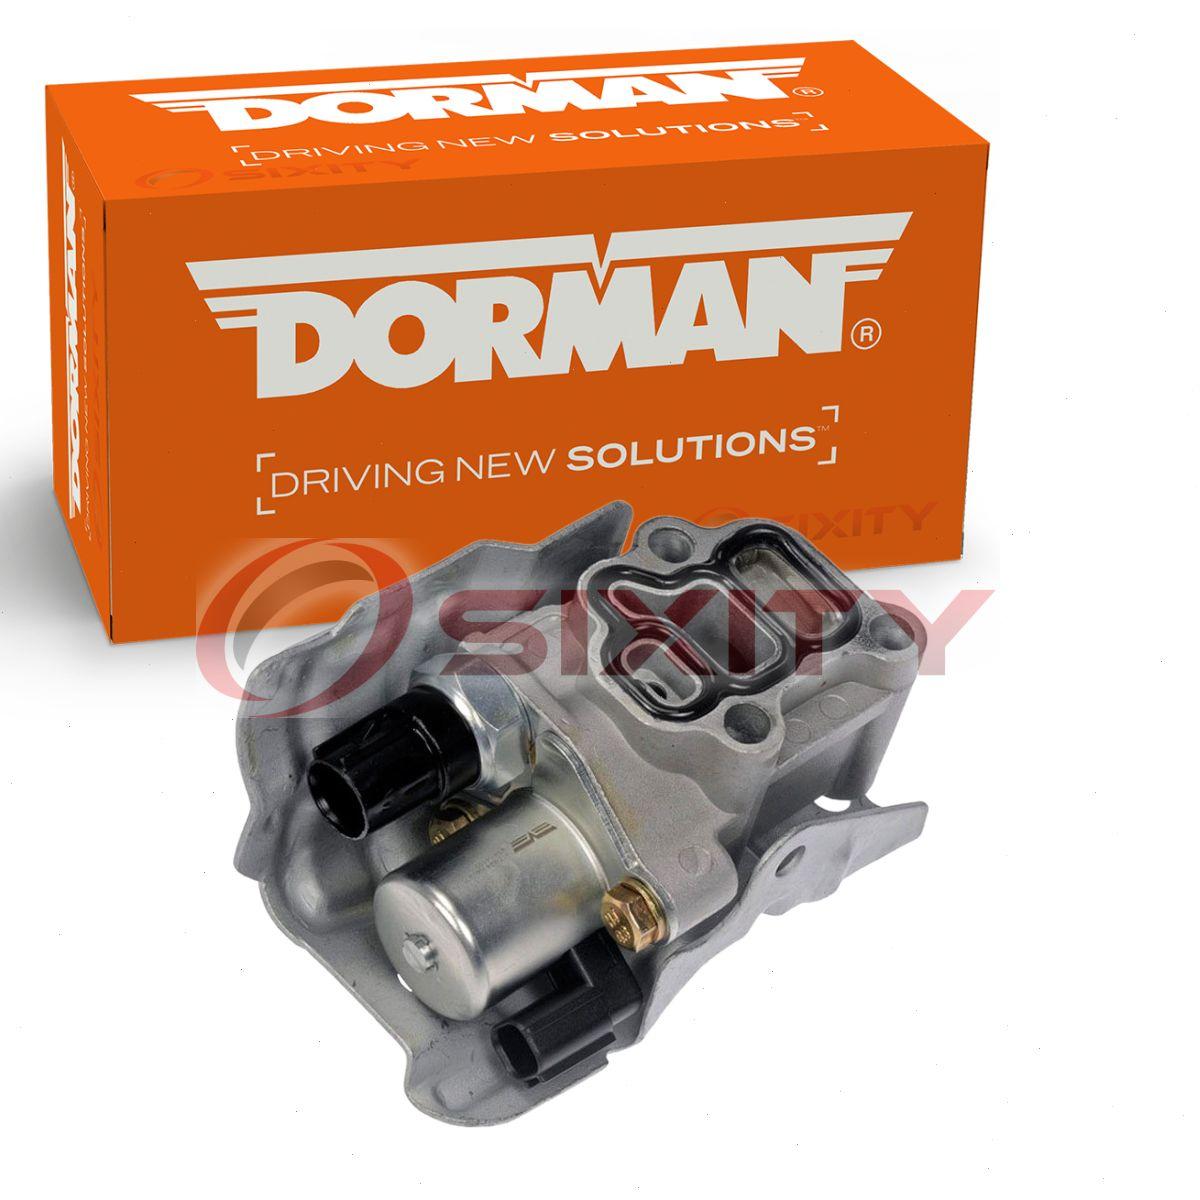 For Honda Element Accord 2003-11 Engine Variable Timing Solenoid Dorman 917-277